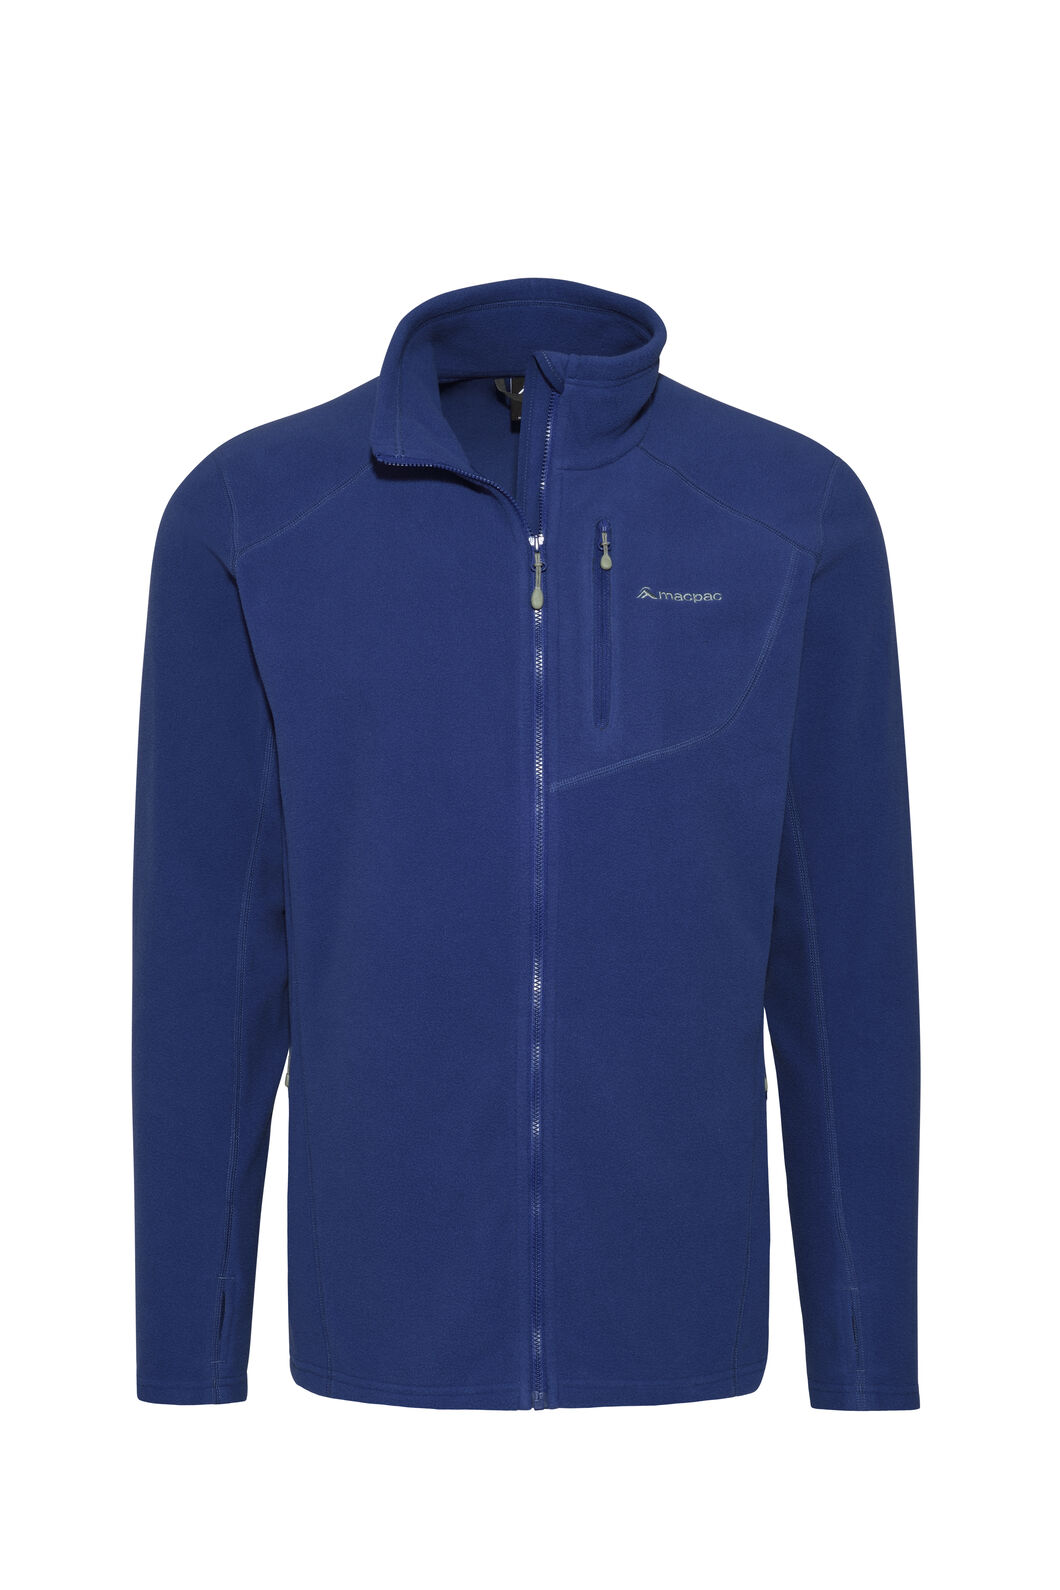 Macpac Kea Polartec® Micro Fleece® Jacket — Men's, Blueprint, hi-res